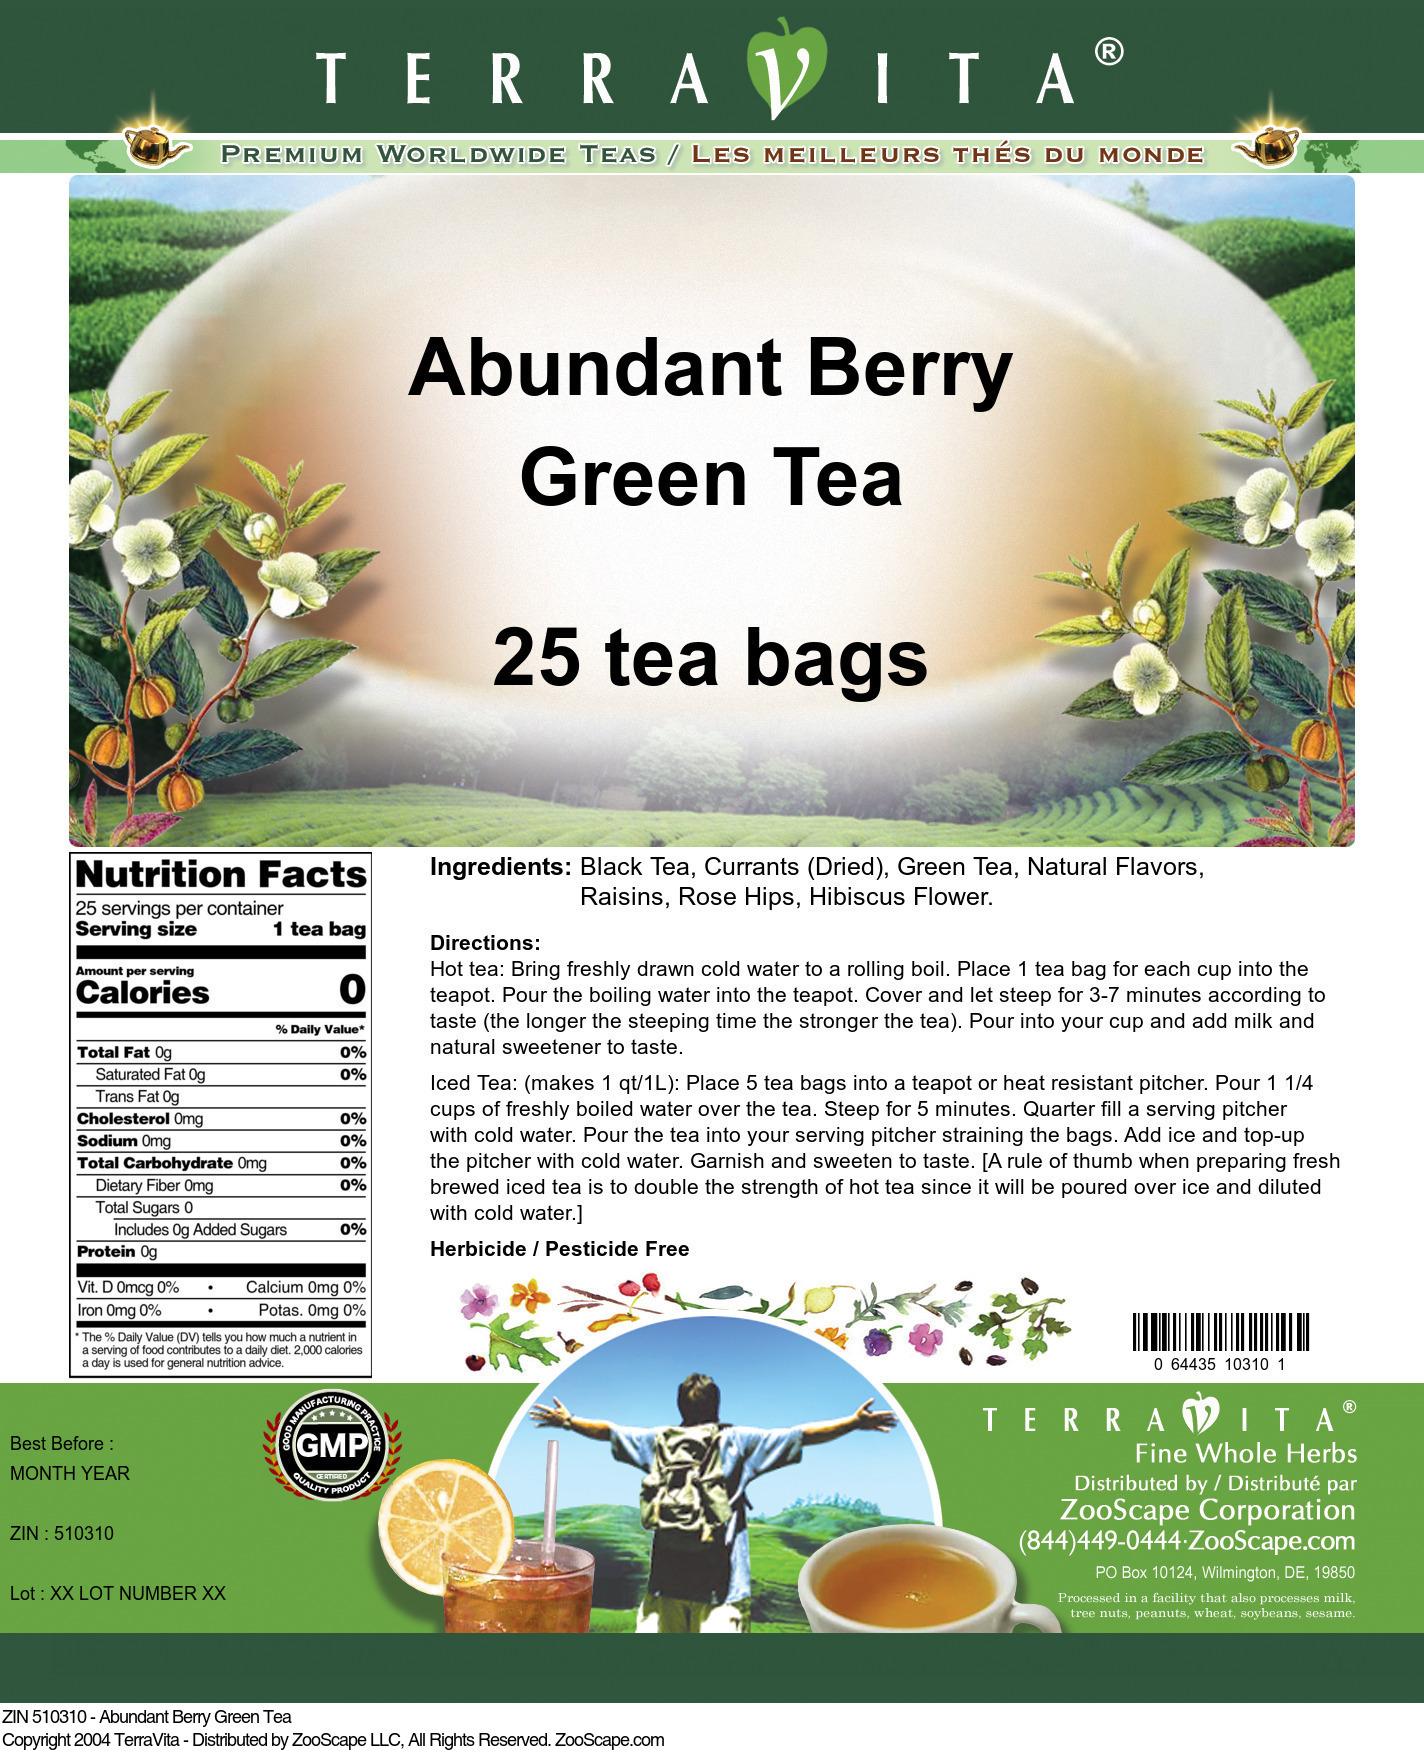 Abundant Berry Green Tea